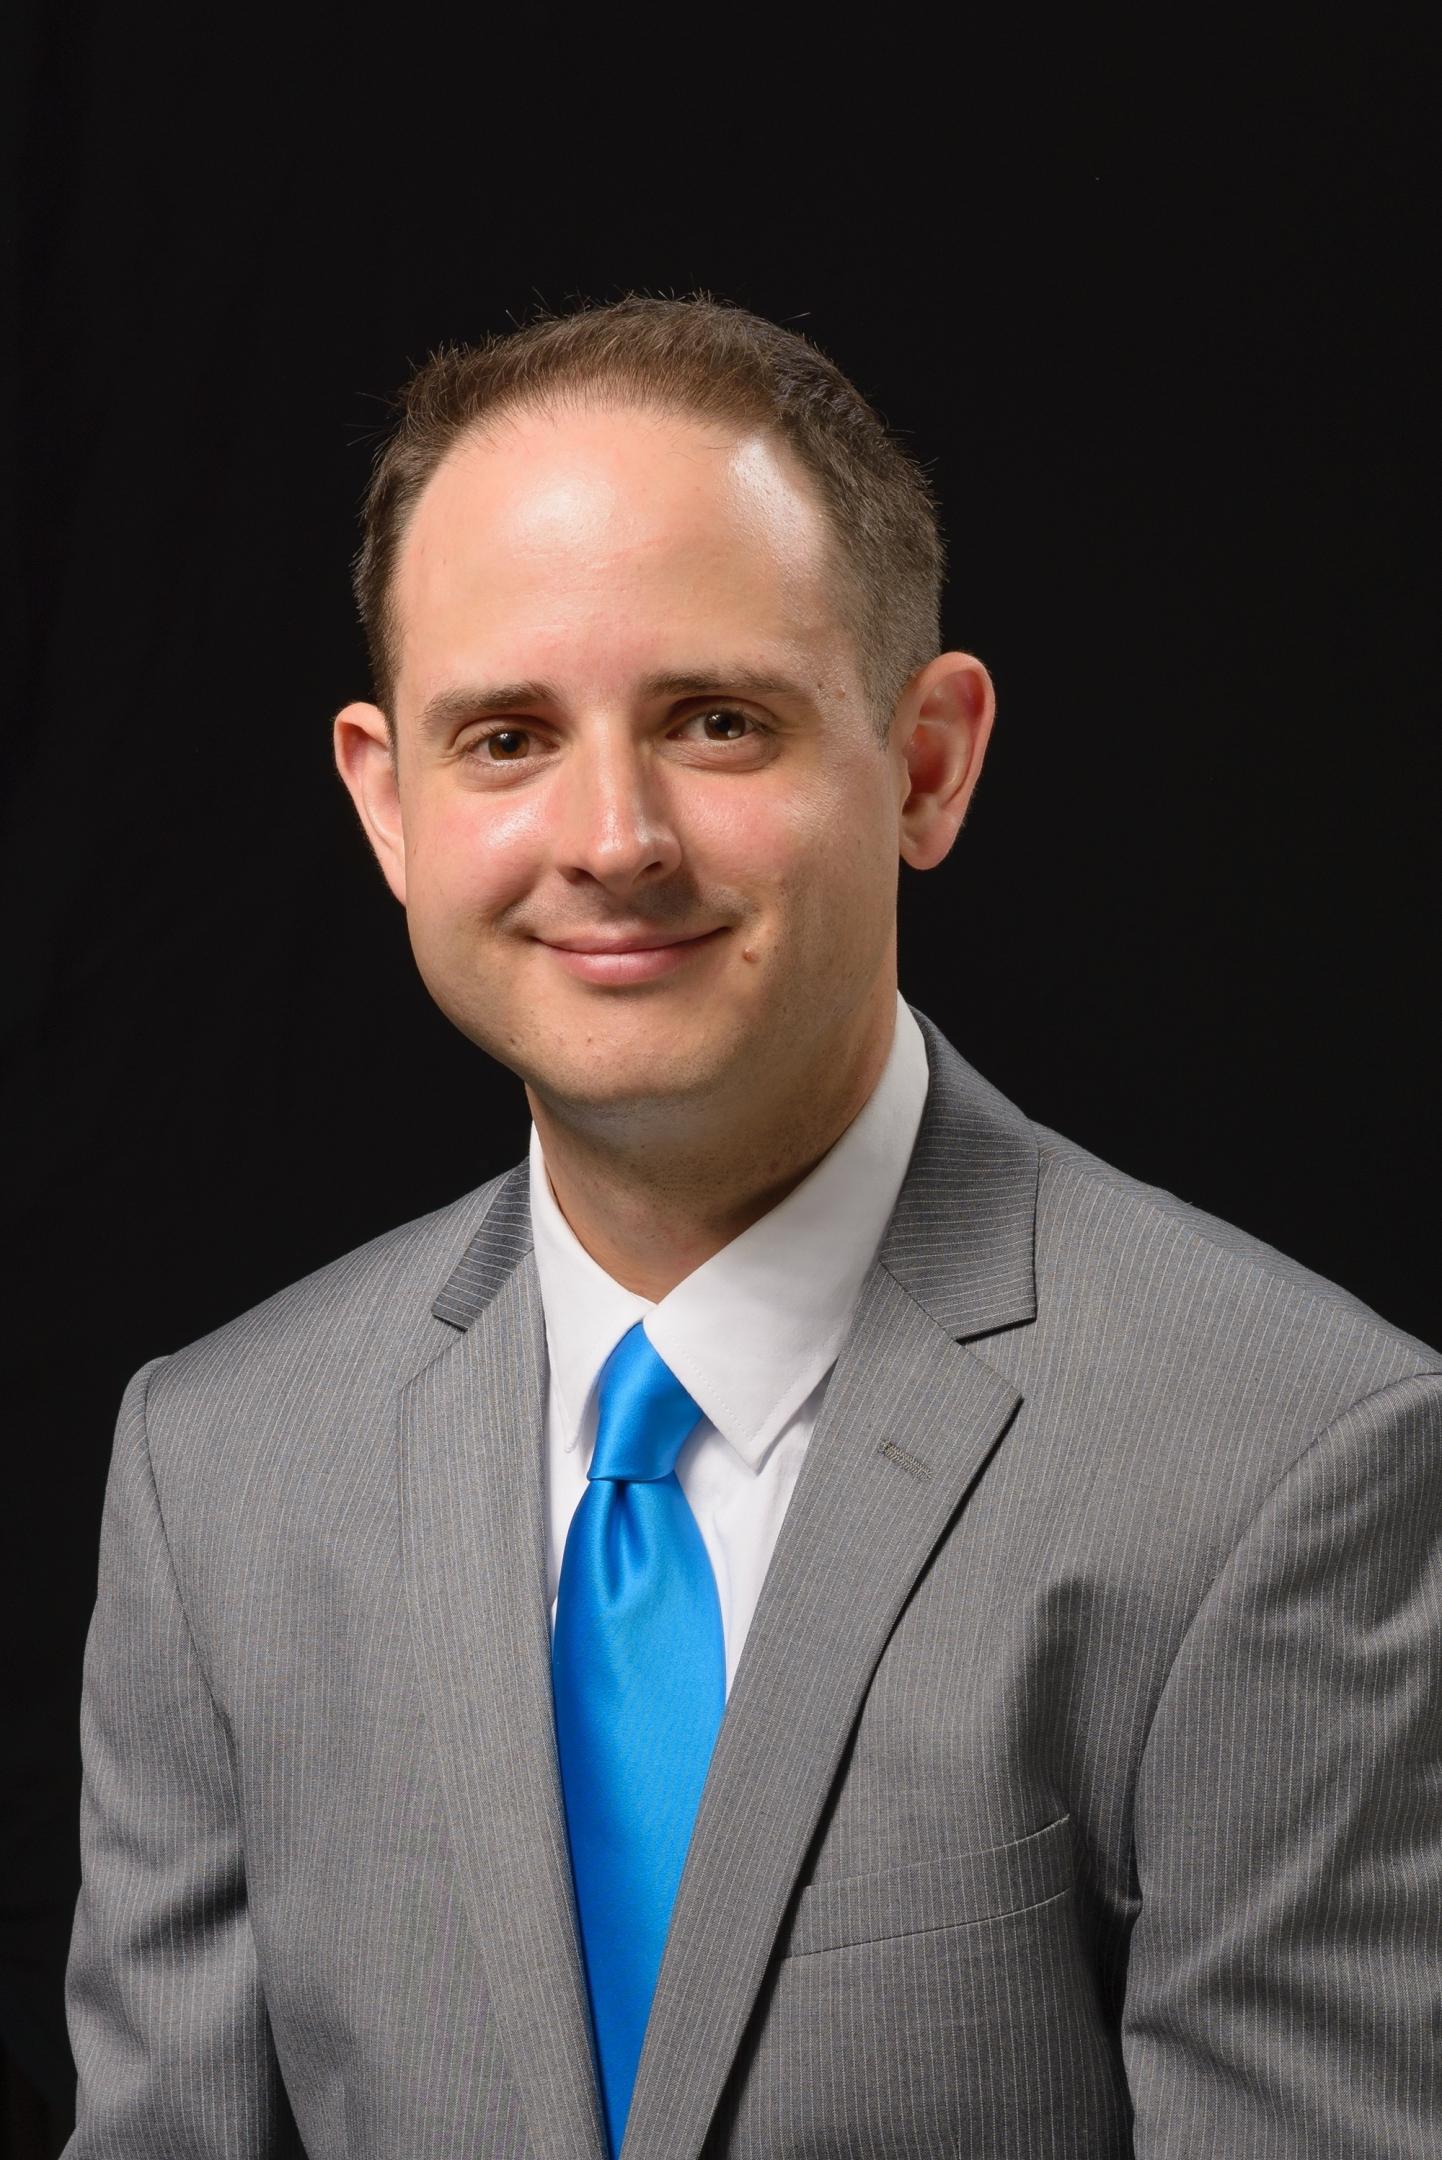 Michael Butler Headshot